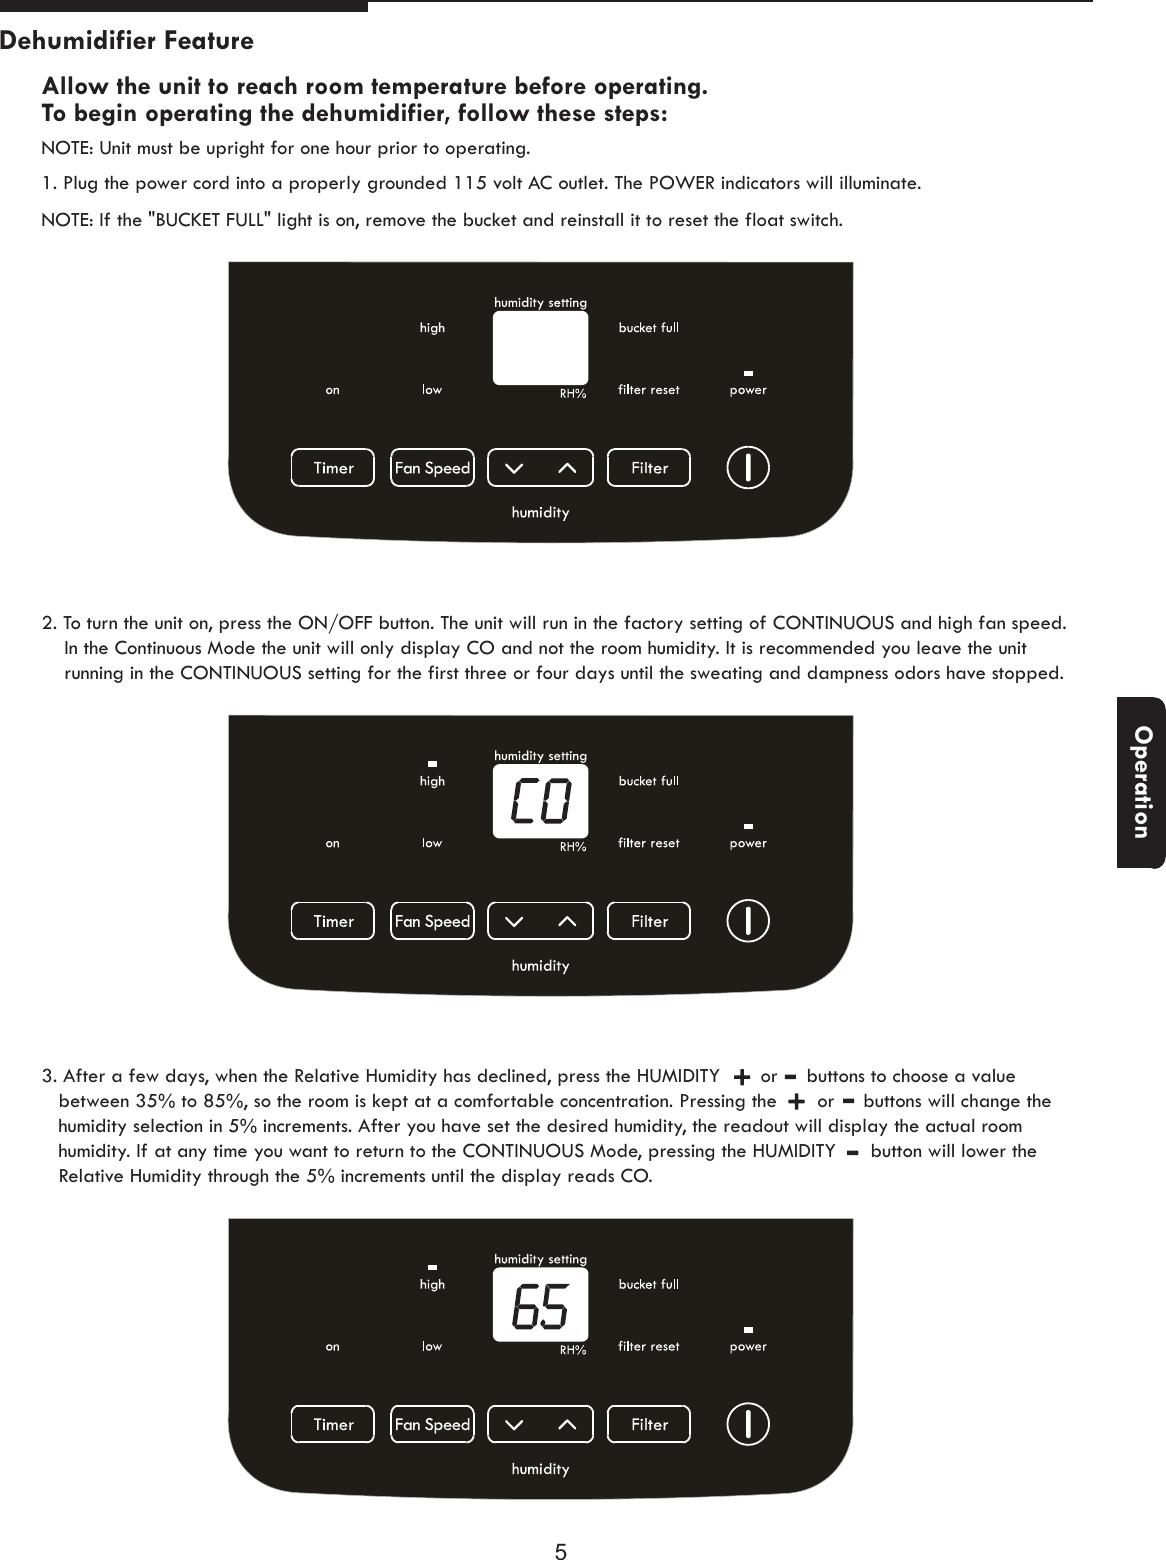 Kenmore Dehumidifier 253 25001 Users Manual 灏侀潰